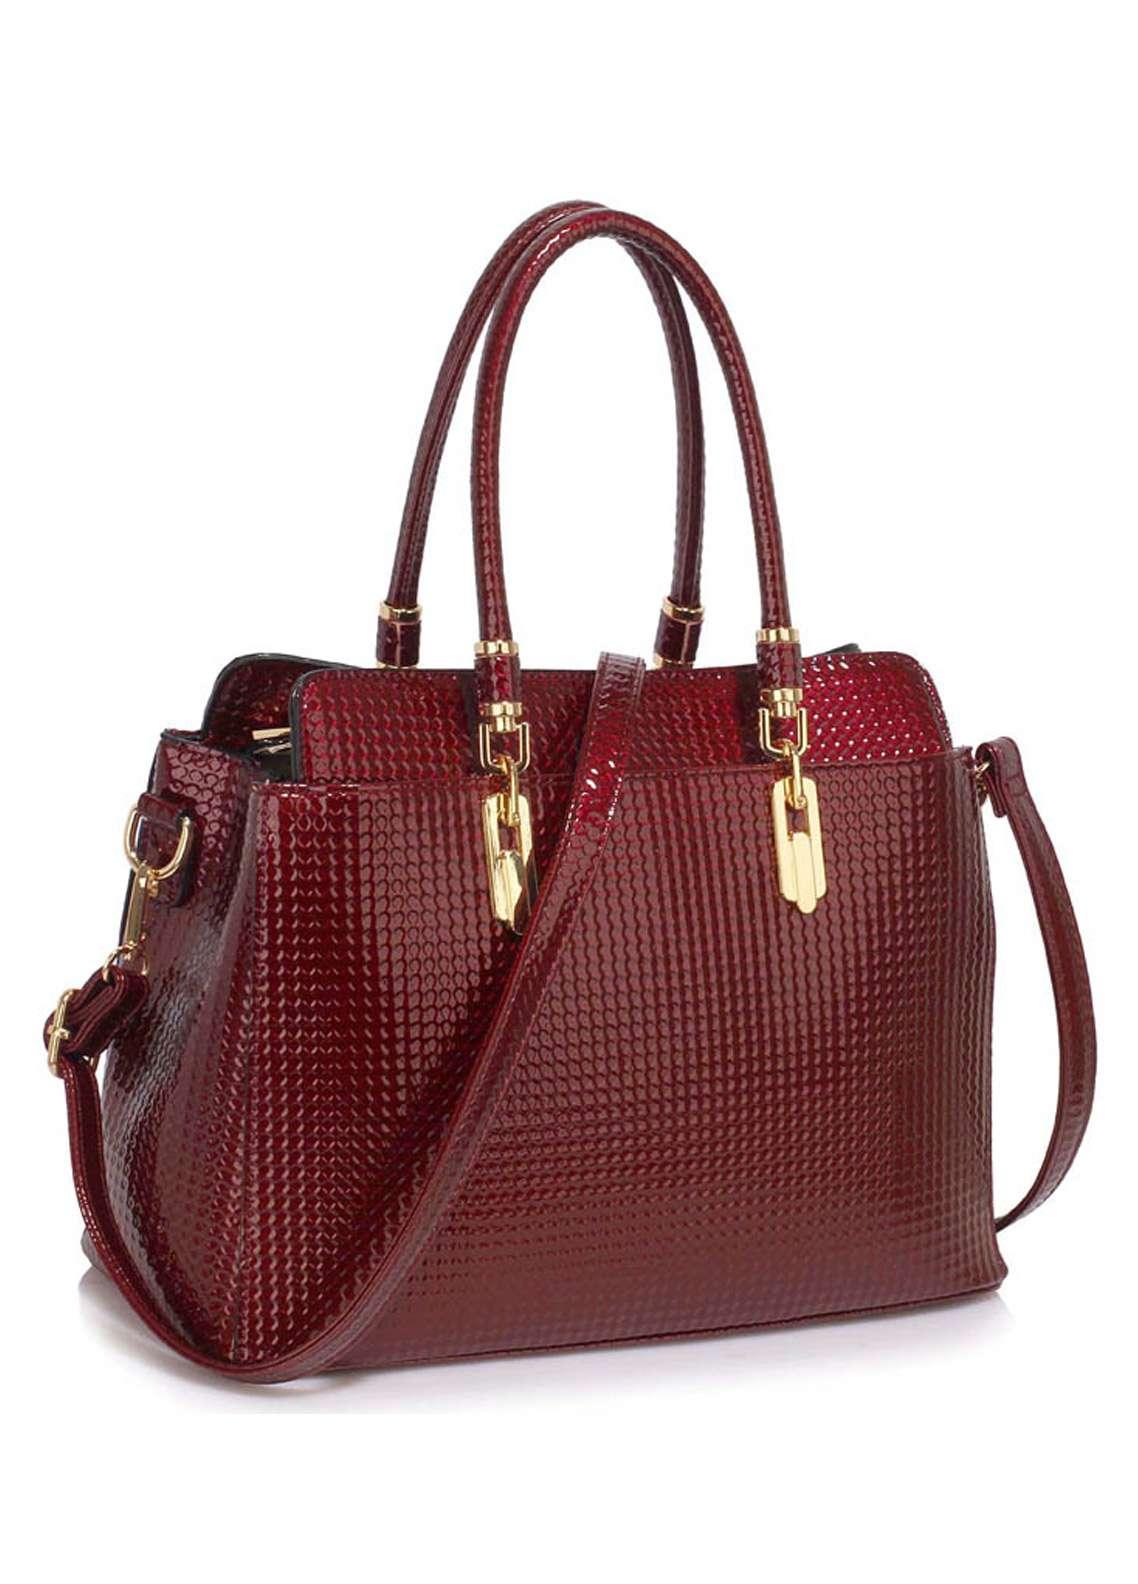 Leesun London Faux Leather Satchels Bags for Women Burgundy